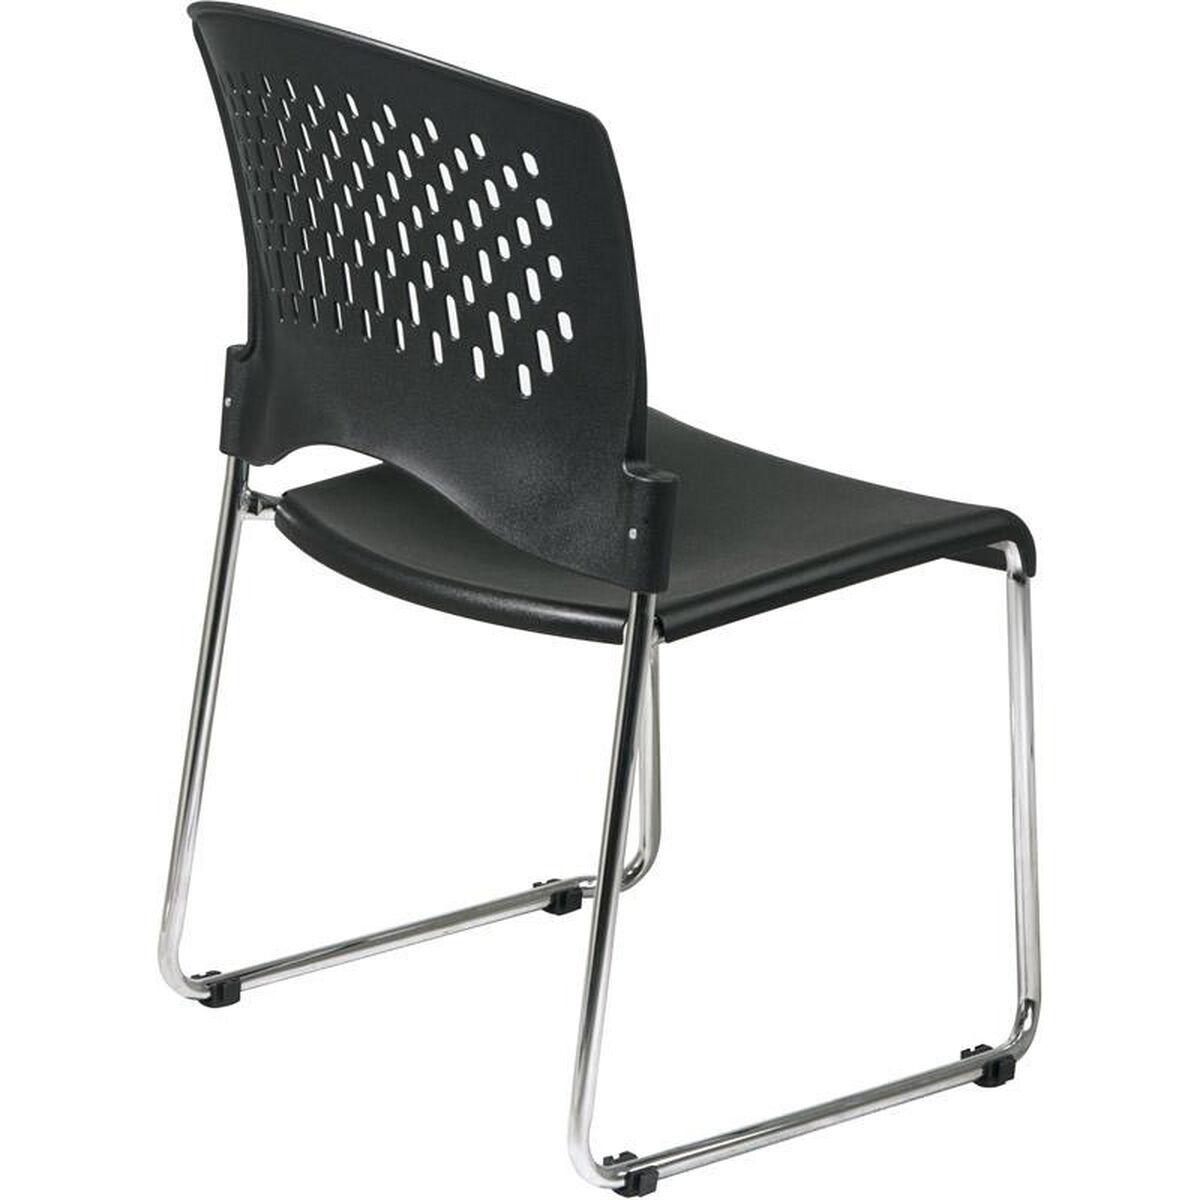 work smart chrome frame sled base stack chair with plastic seat and back set of 2 black. Black Bedroom Furniture Sets. Home Design Ideas